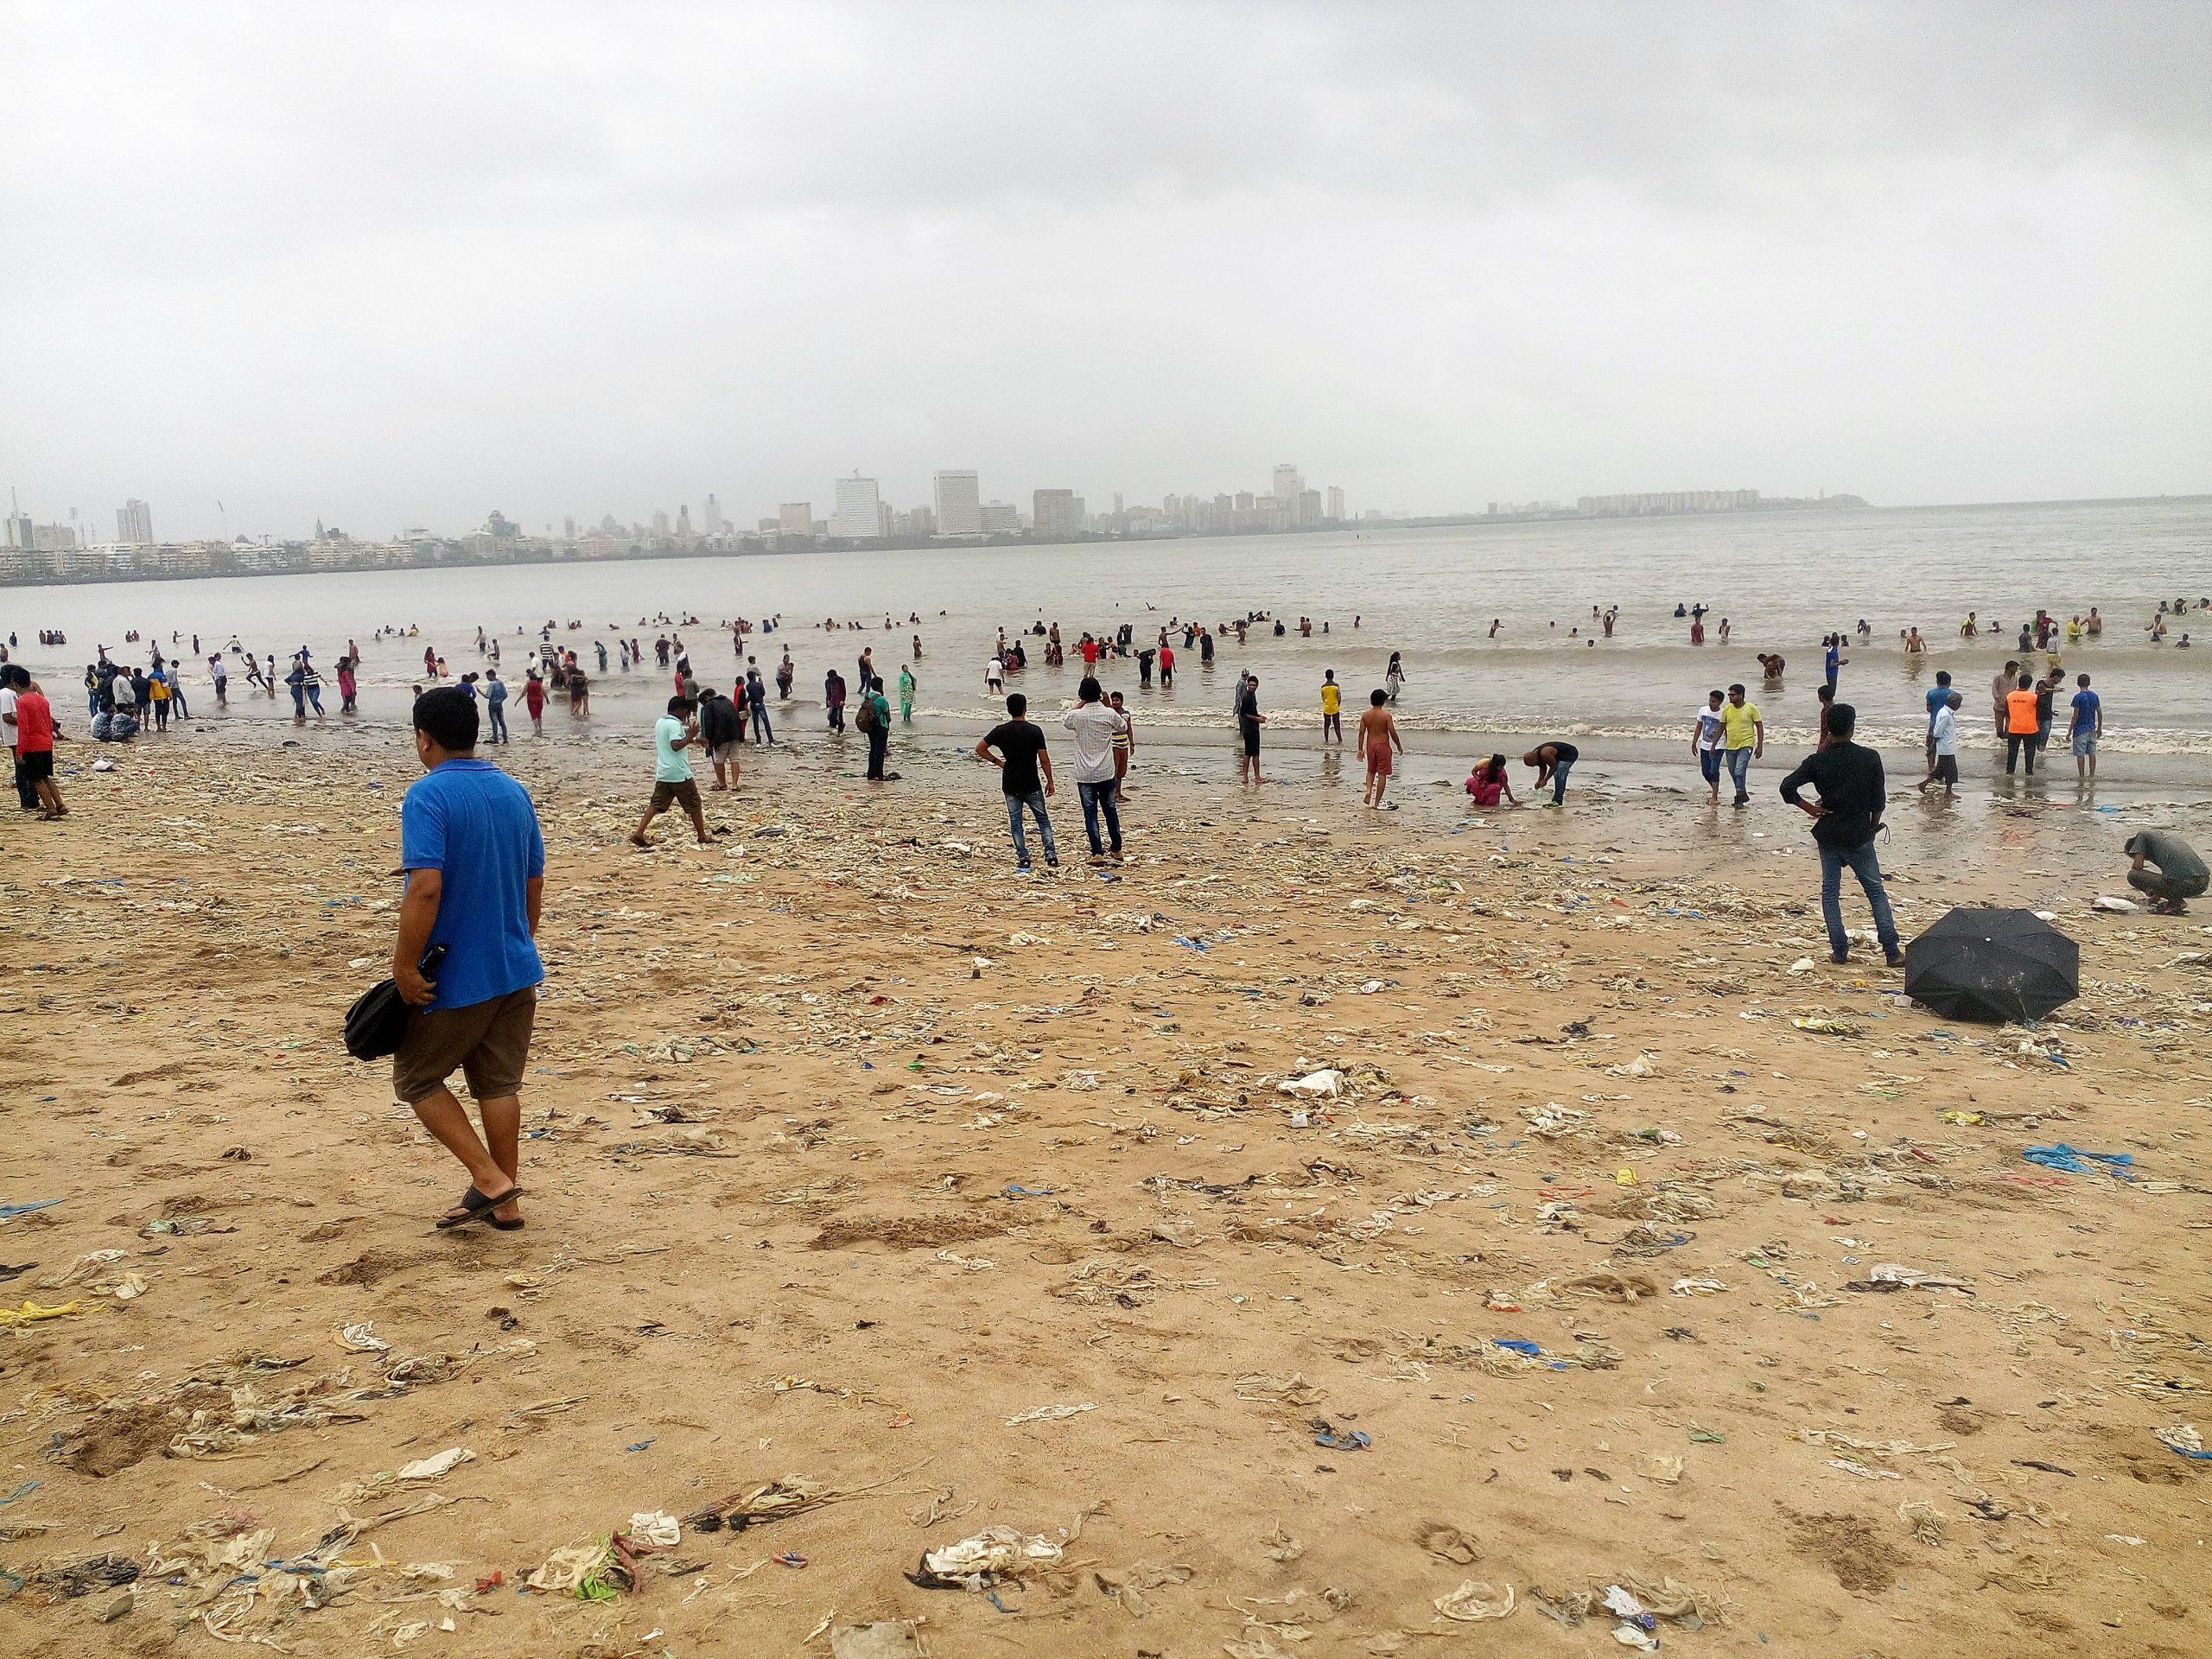 People at Chowpatty beach in Mumbai